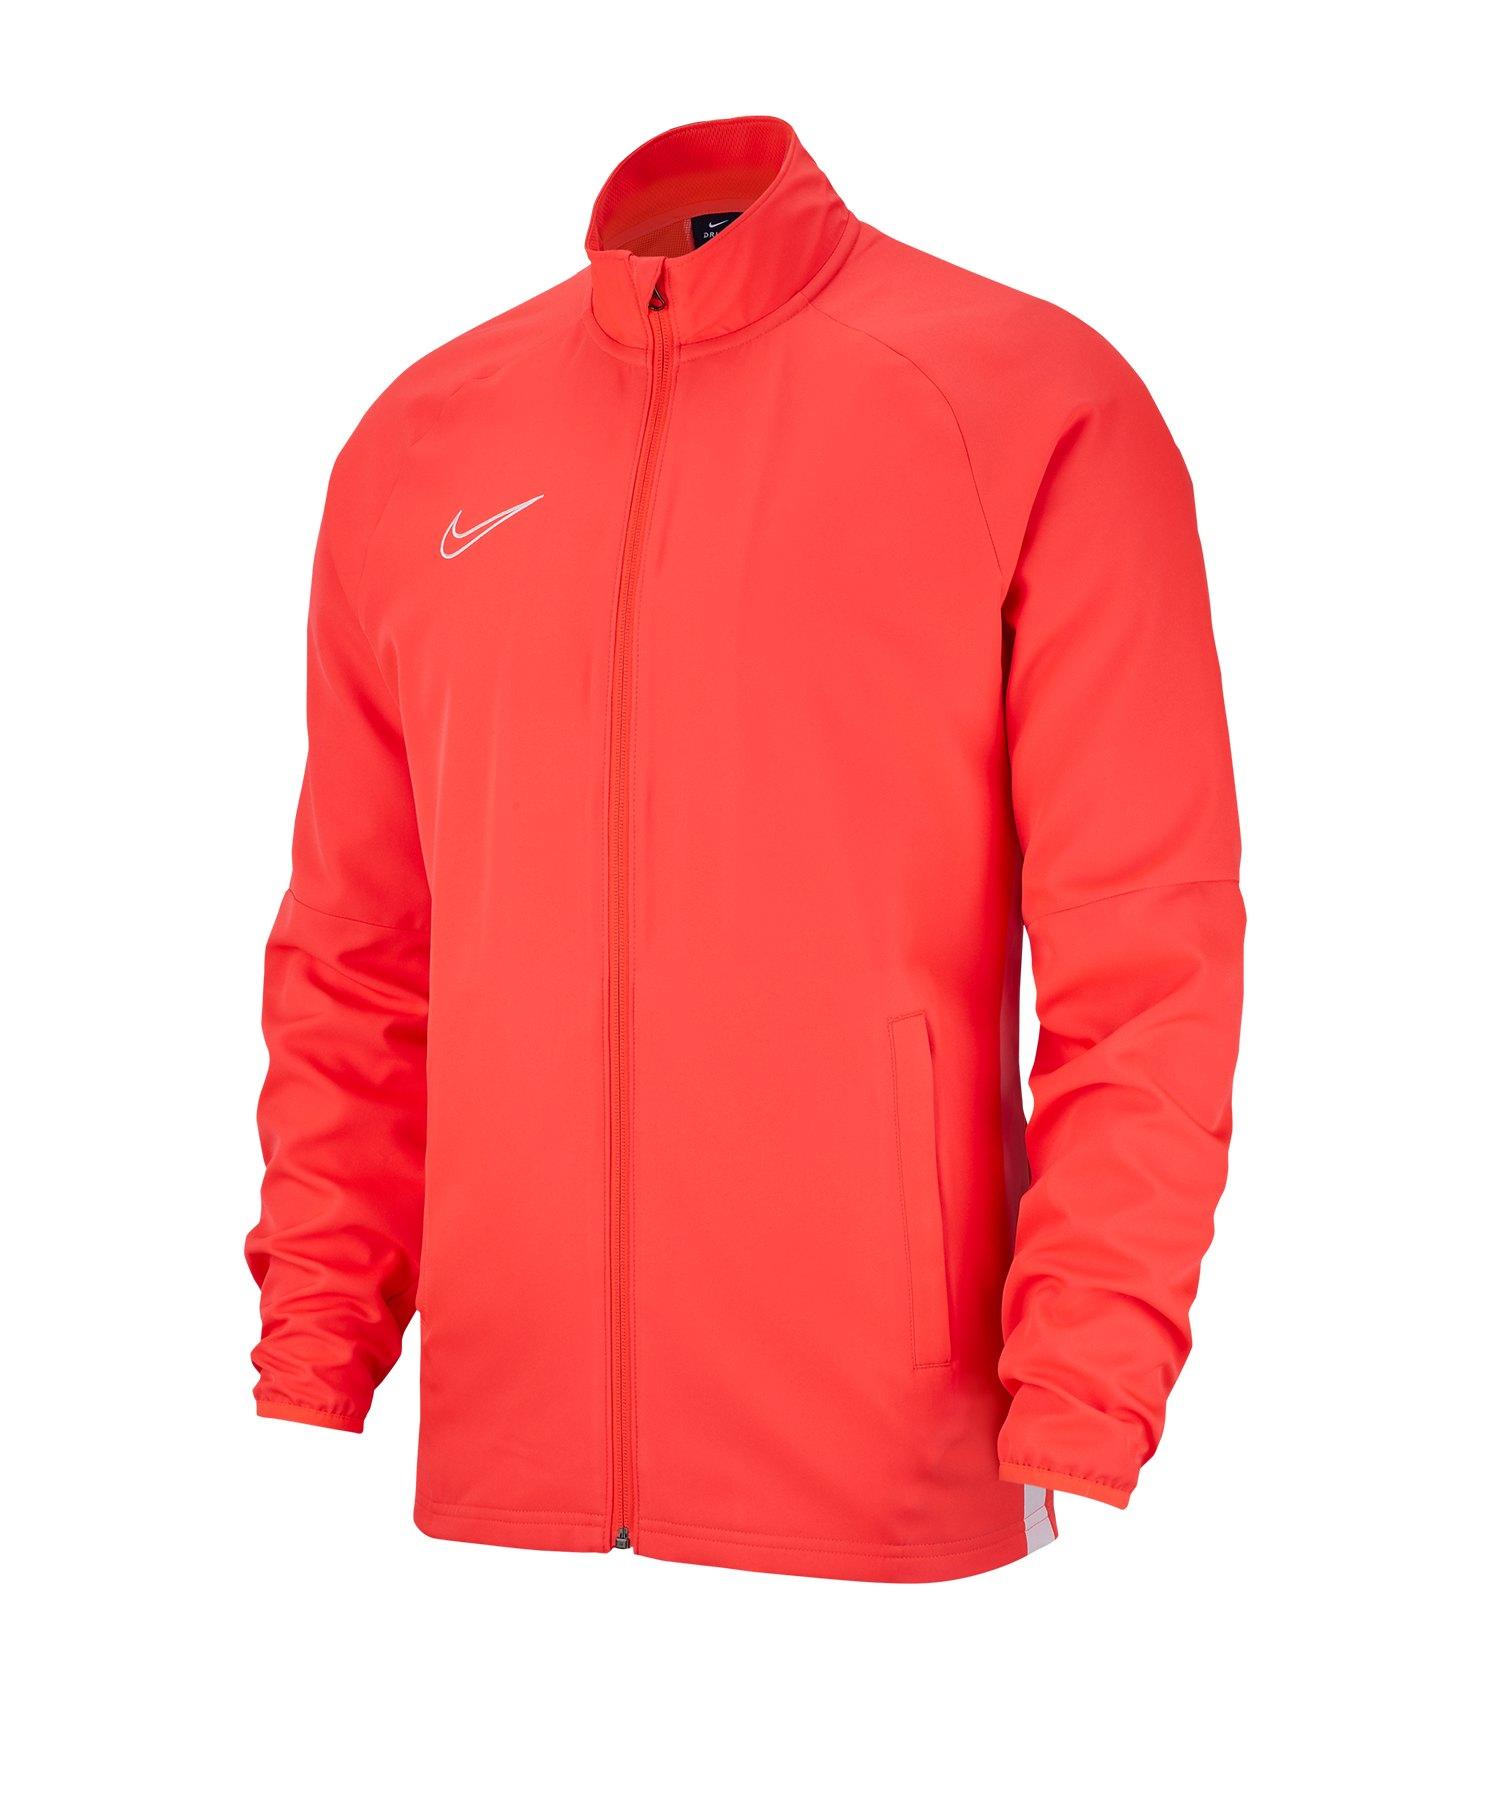 Nike Academy 19 Präsentationsjacke Kids Rot F671 - rot